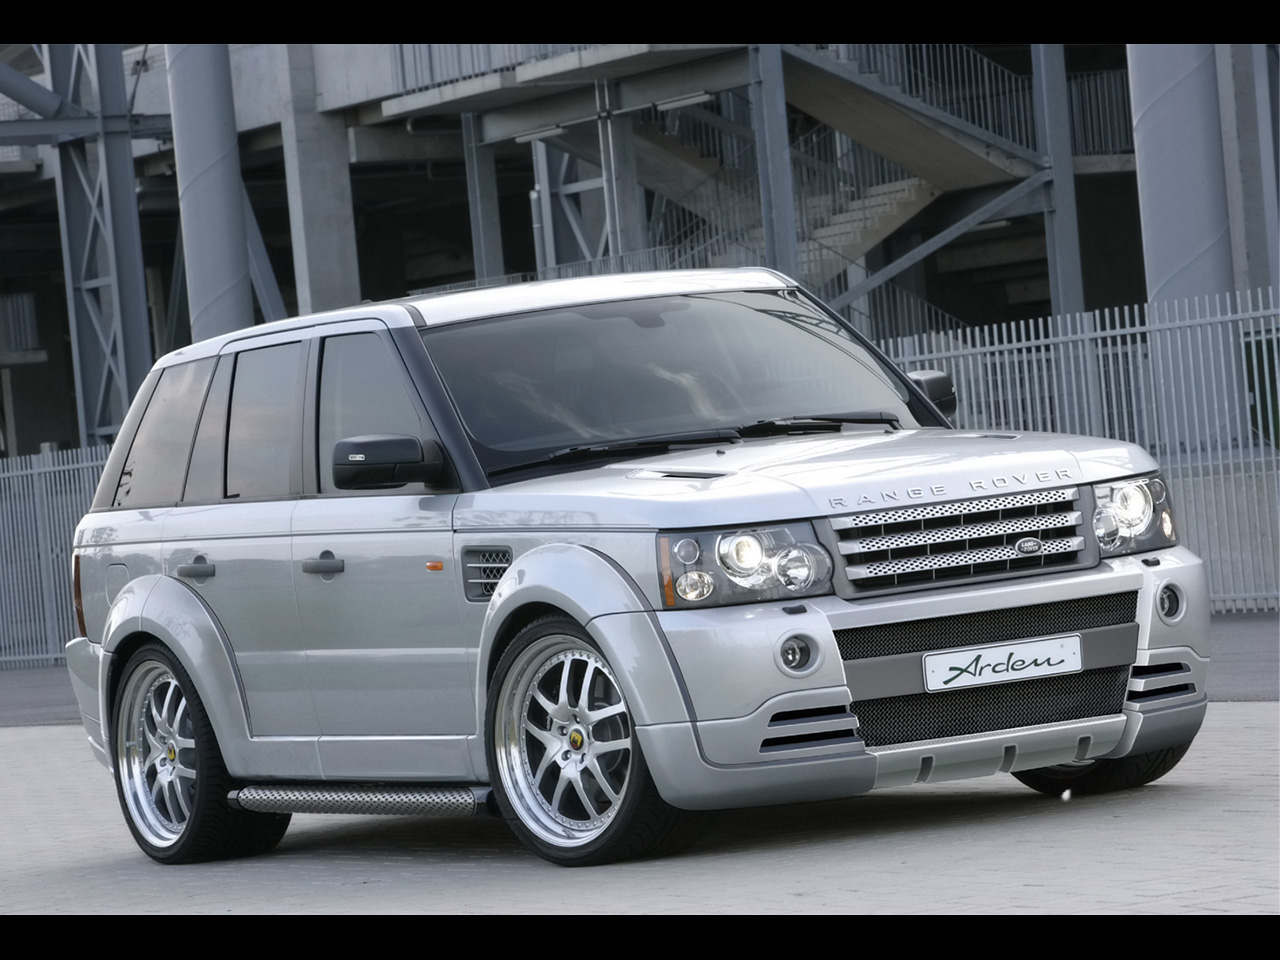 https://www.conceptcarz.com/images/Land%20Rover/Arden-Range-Rover-Sport-AR6-manu-01.jpg